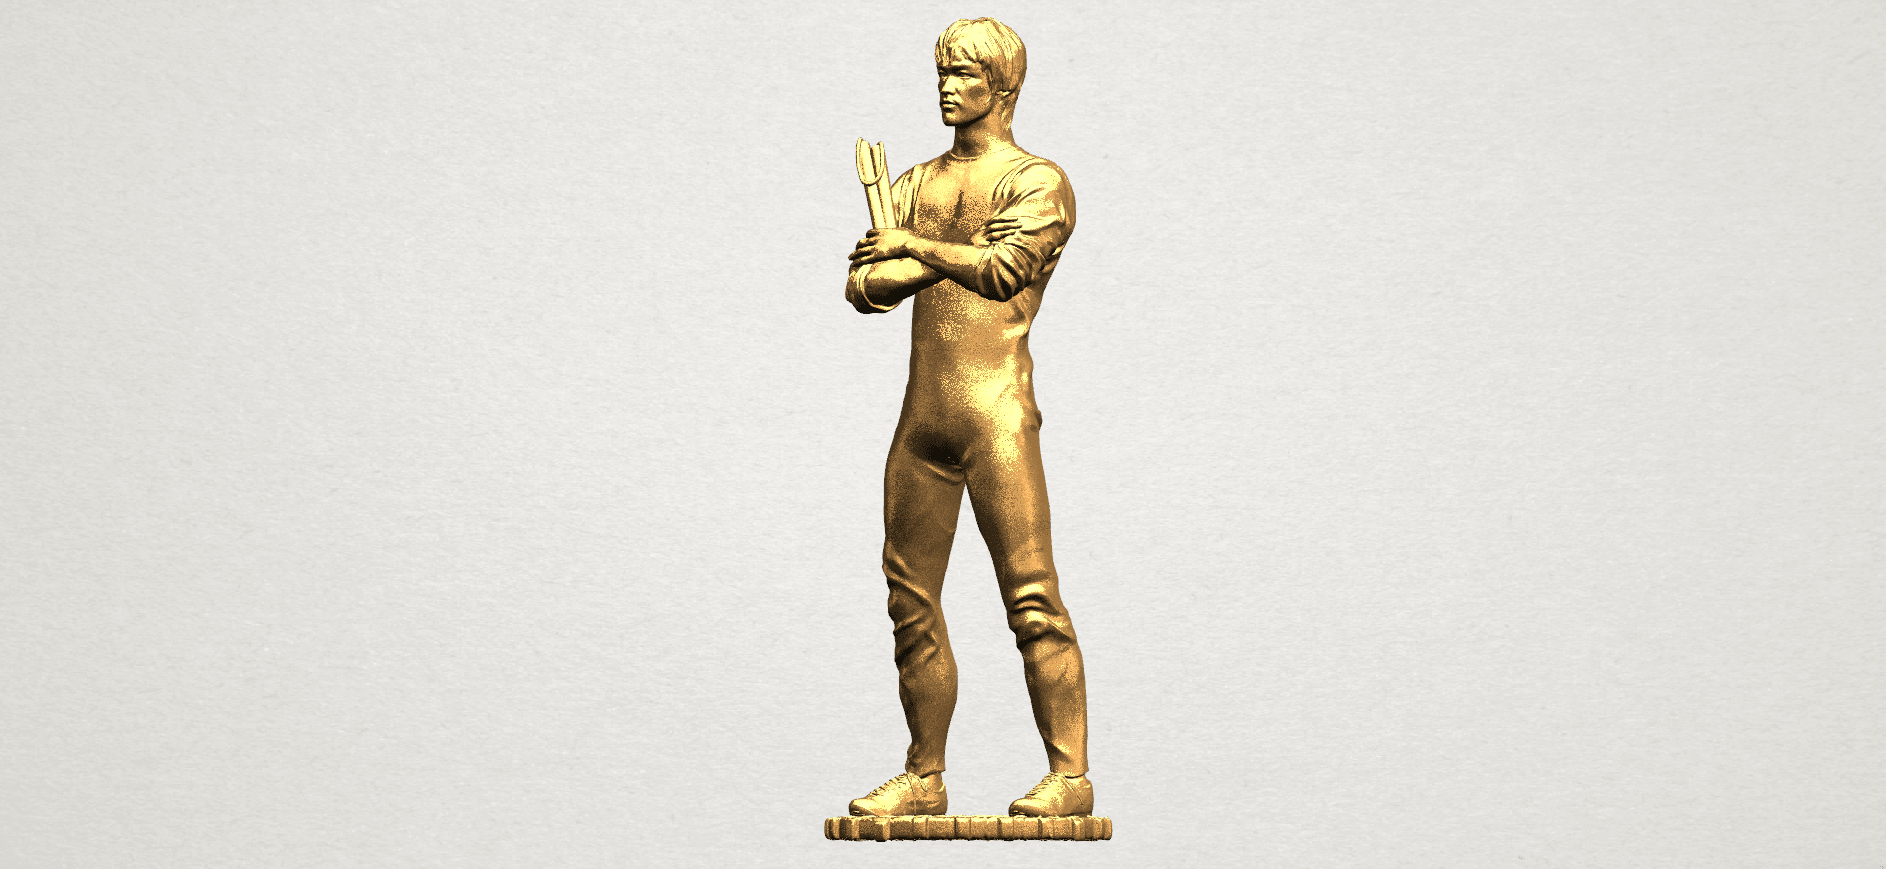 Bruce Lee A02.png Download free STL file Bruce Lee • 3D printing design, GeorgesNikkei